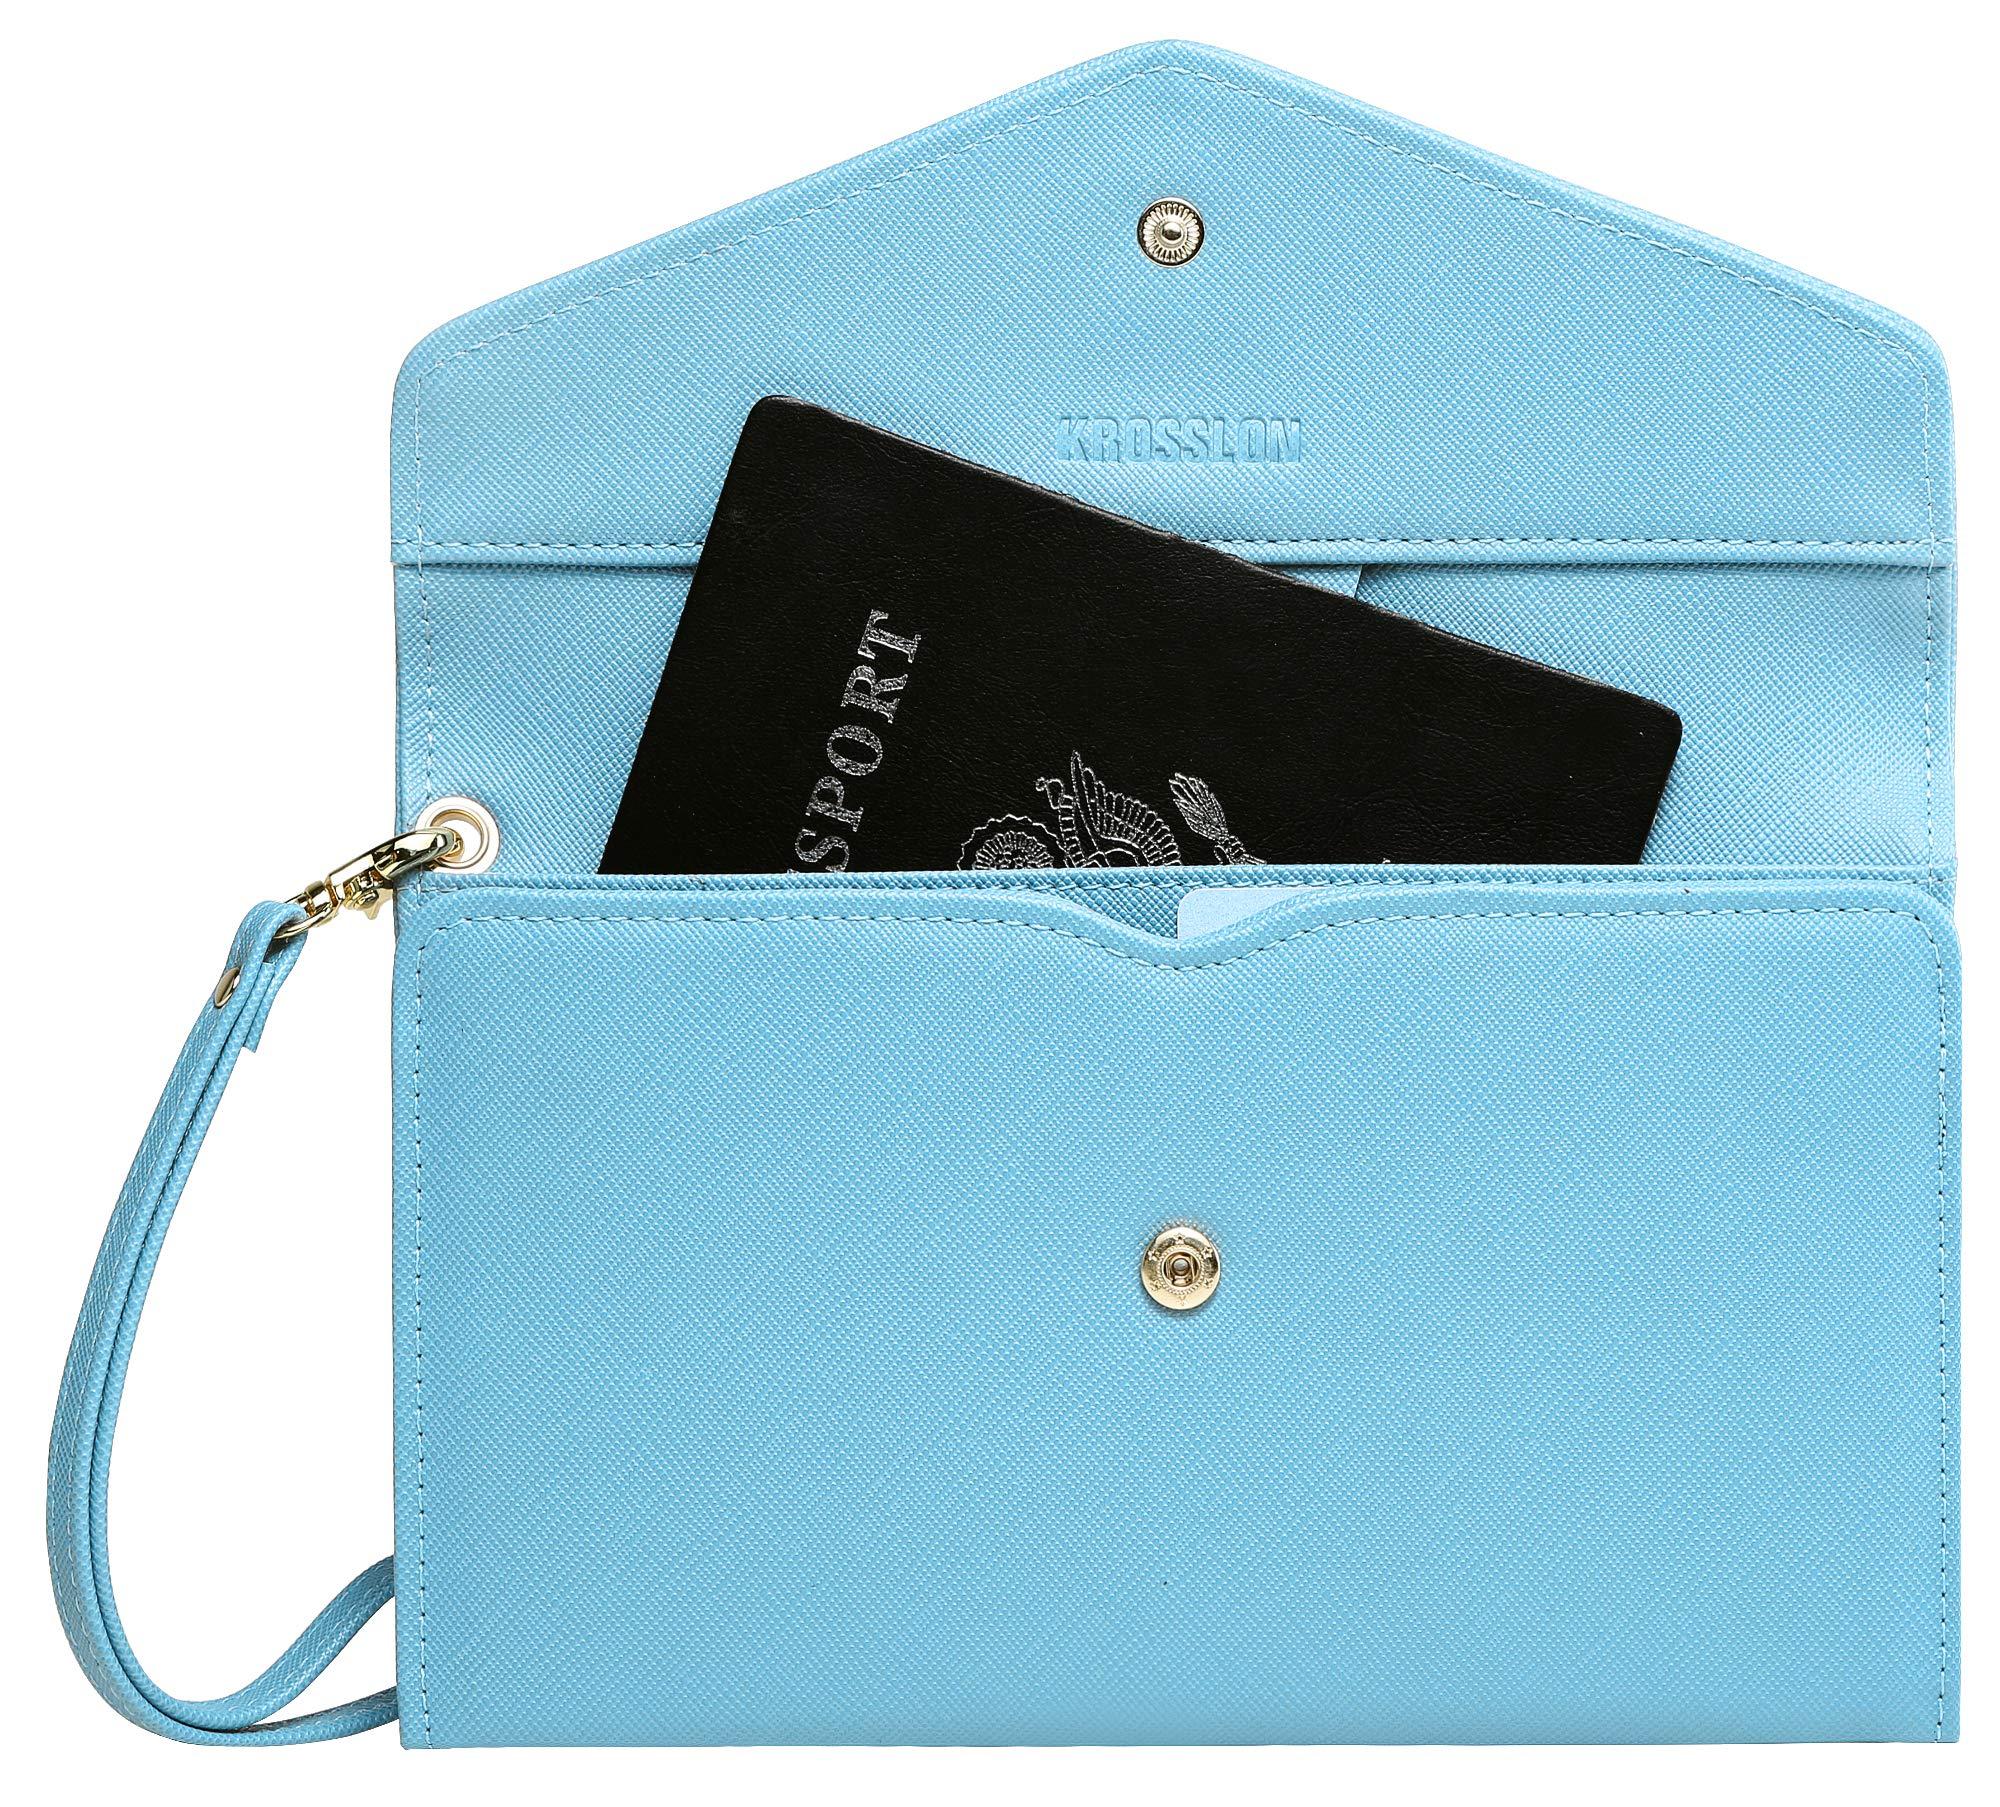 Krosslon Travel Passport Wallet for Women Rfid Wristlet Slim Family Document Holder, 203# Blue Hawaii